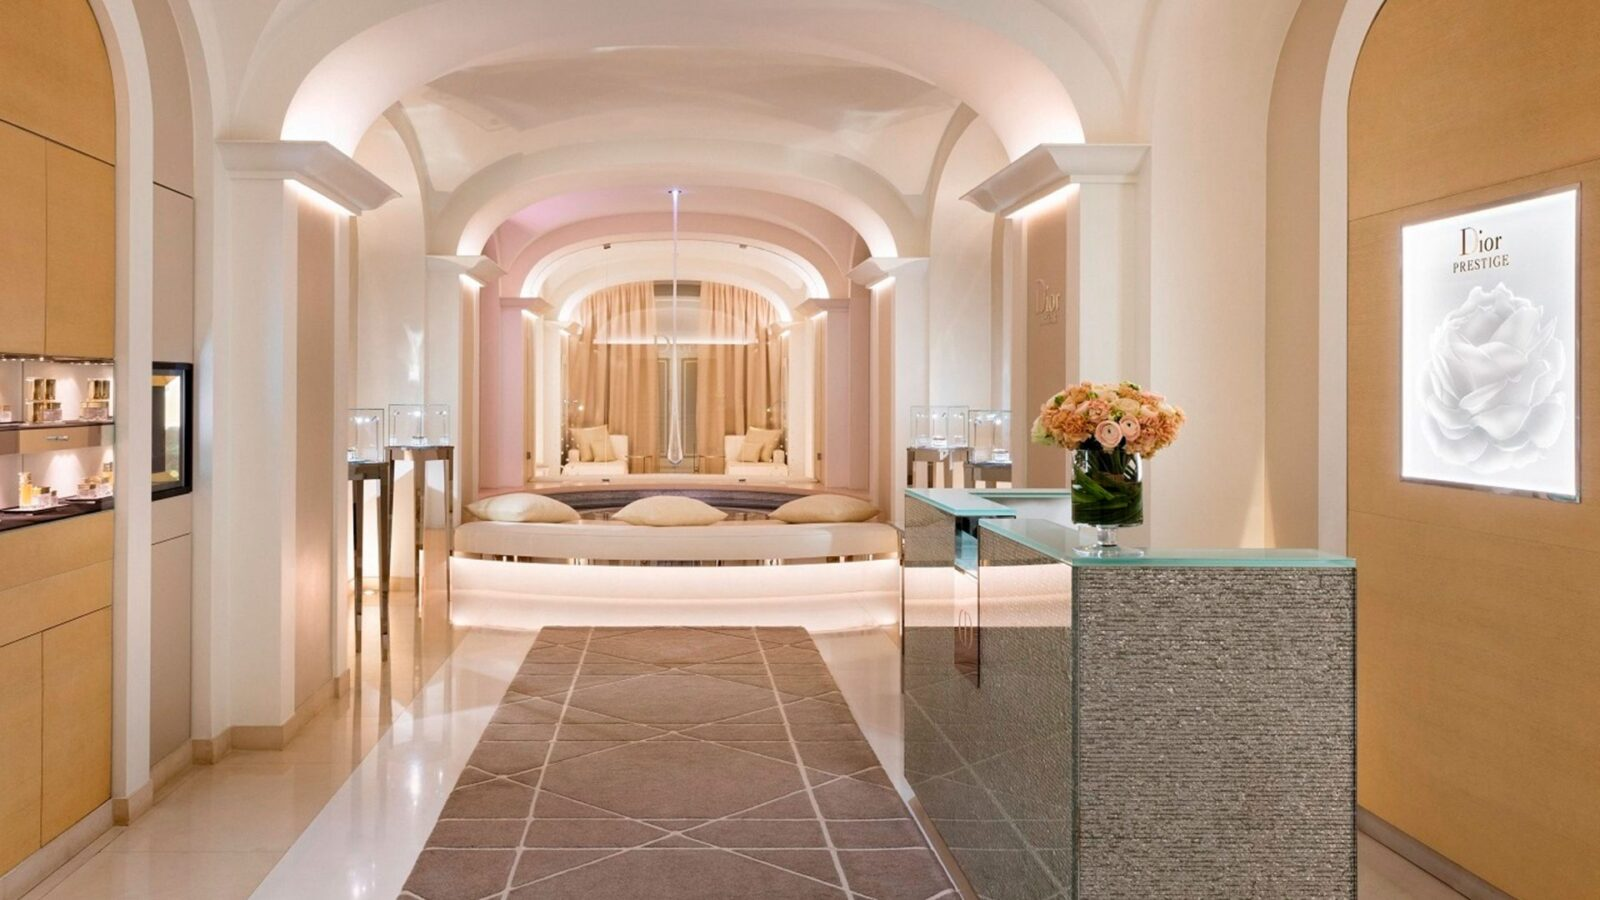 dior institut au h tel plaza ath n e dorchester collection. Black Bedroom Furniture Sets. Home Design Ideas